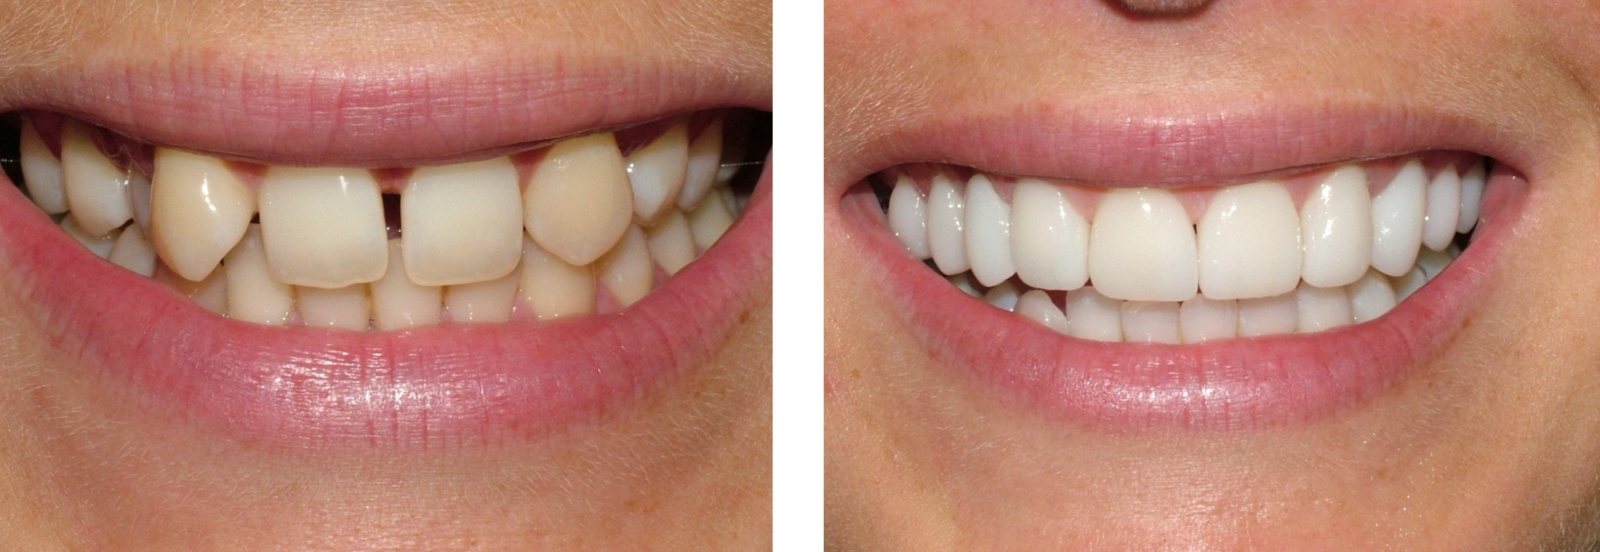 Corectare dinti frontali cu fatete dentare